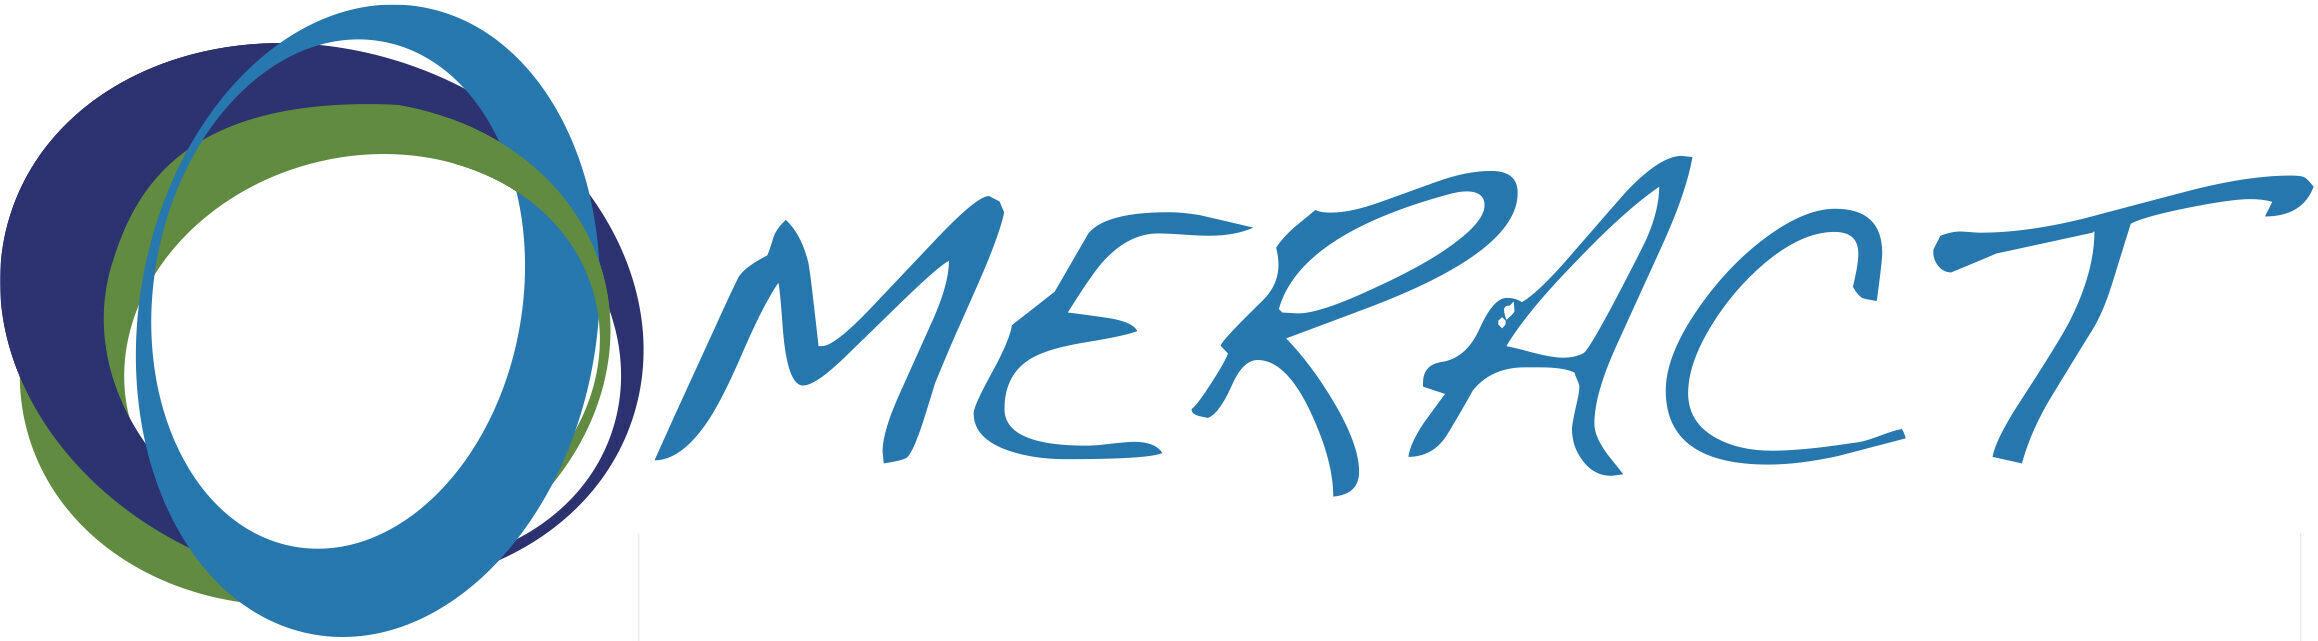 https://secureservercdn.net/45.40.145.201/xkk.60c.myftpupload.com/wp-content/uploads/2021/02/cropped-cropped-cropped-OMERACT-Logo-Final-copy-2-2-1-3.jpg